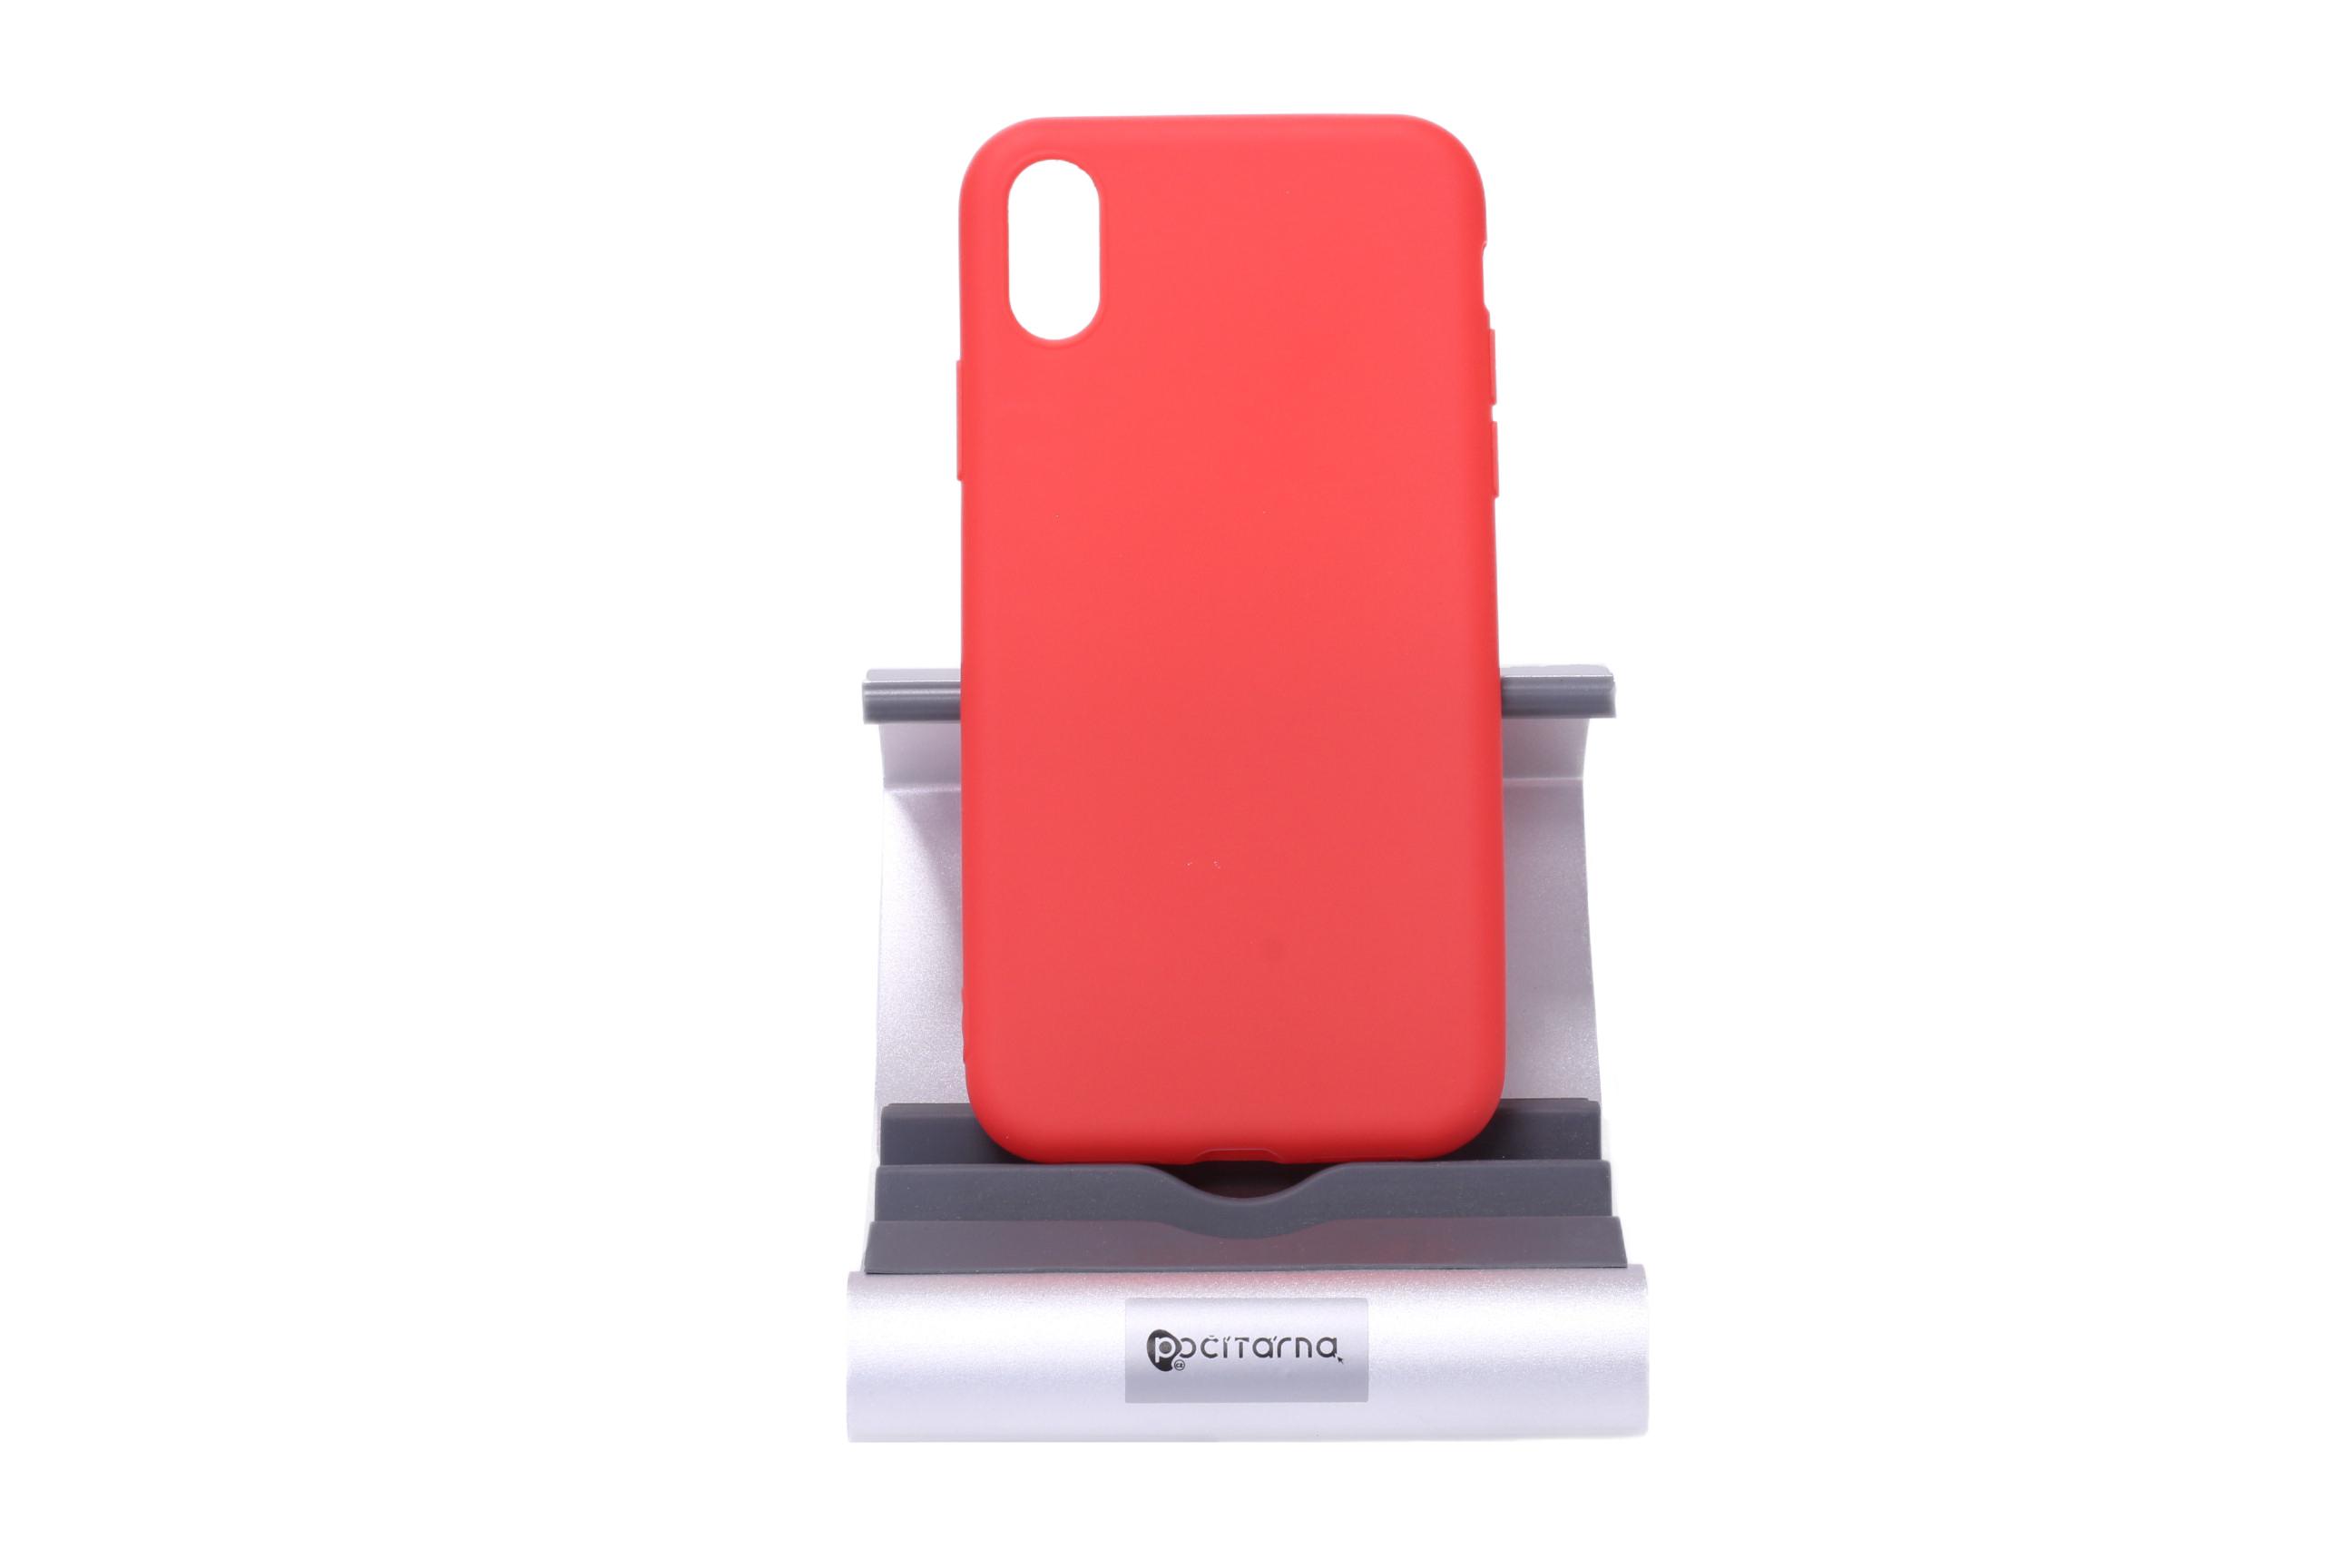 Ochranný kryt pro iPhone X/Xs - Červený